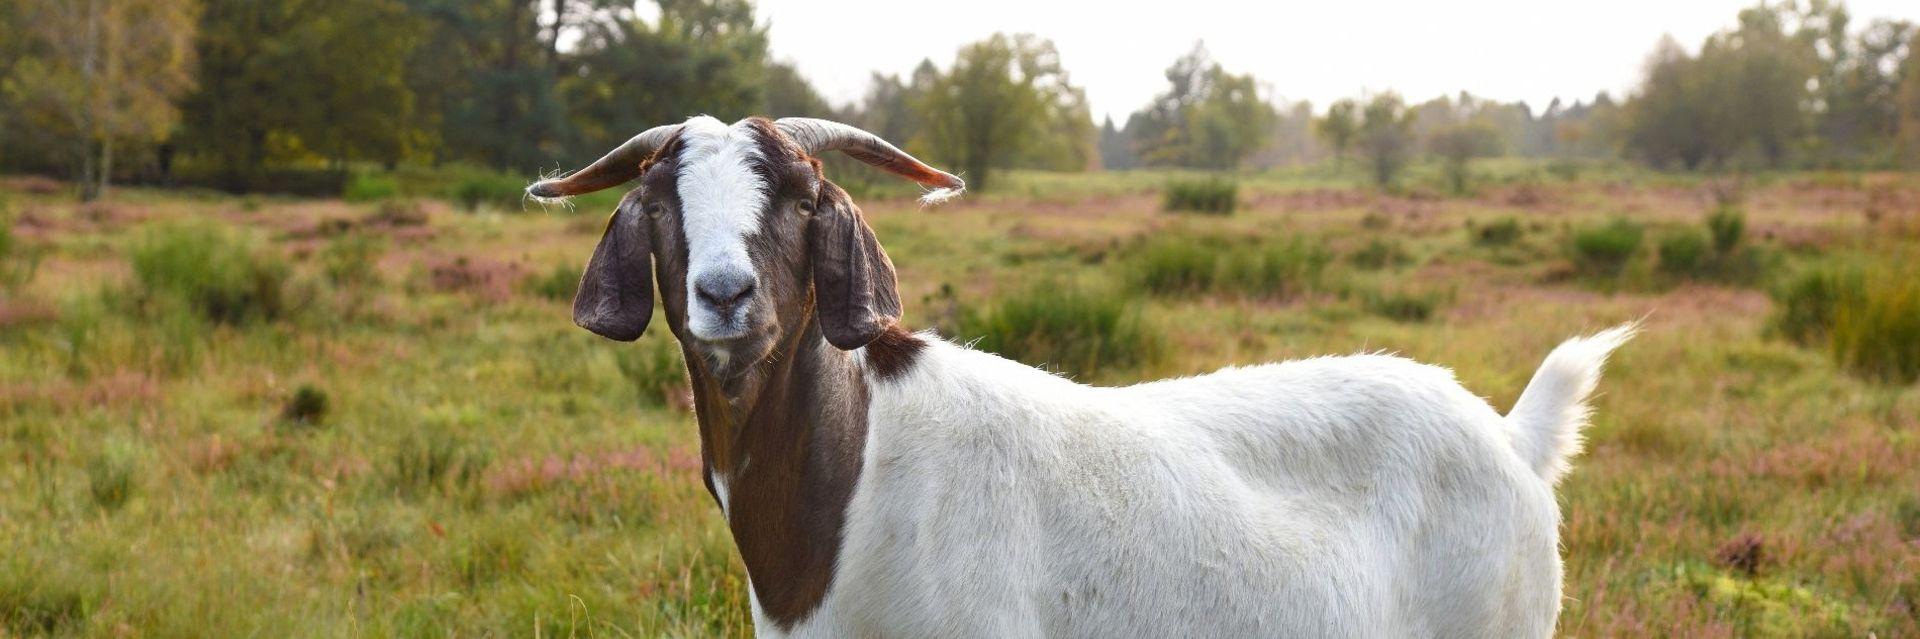 Saisonstart in Holstein